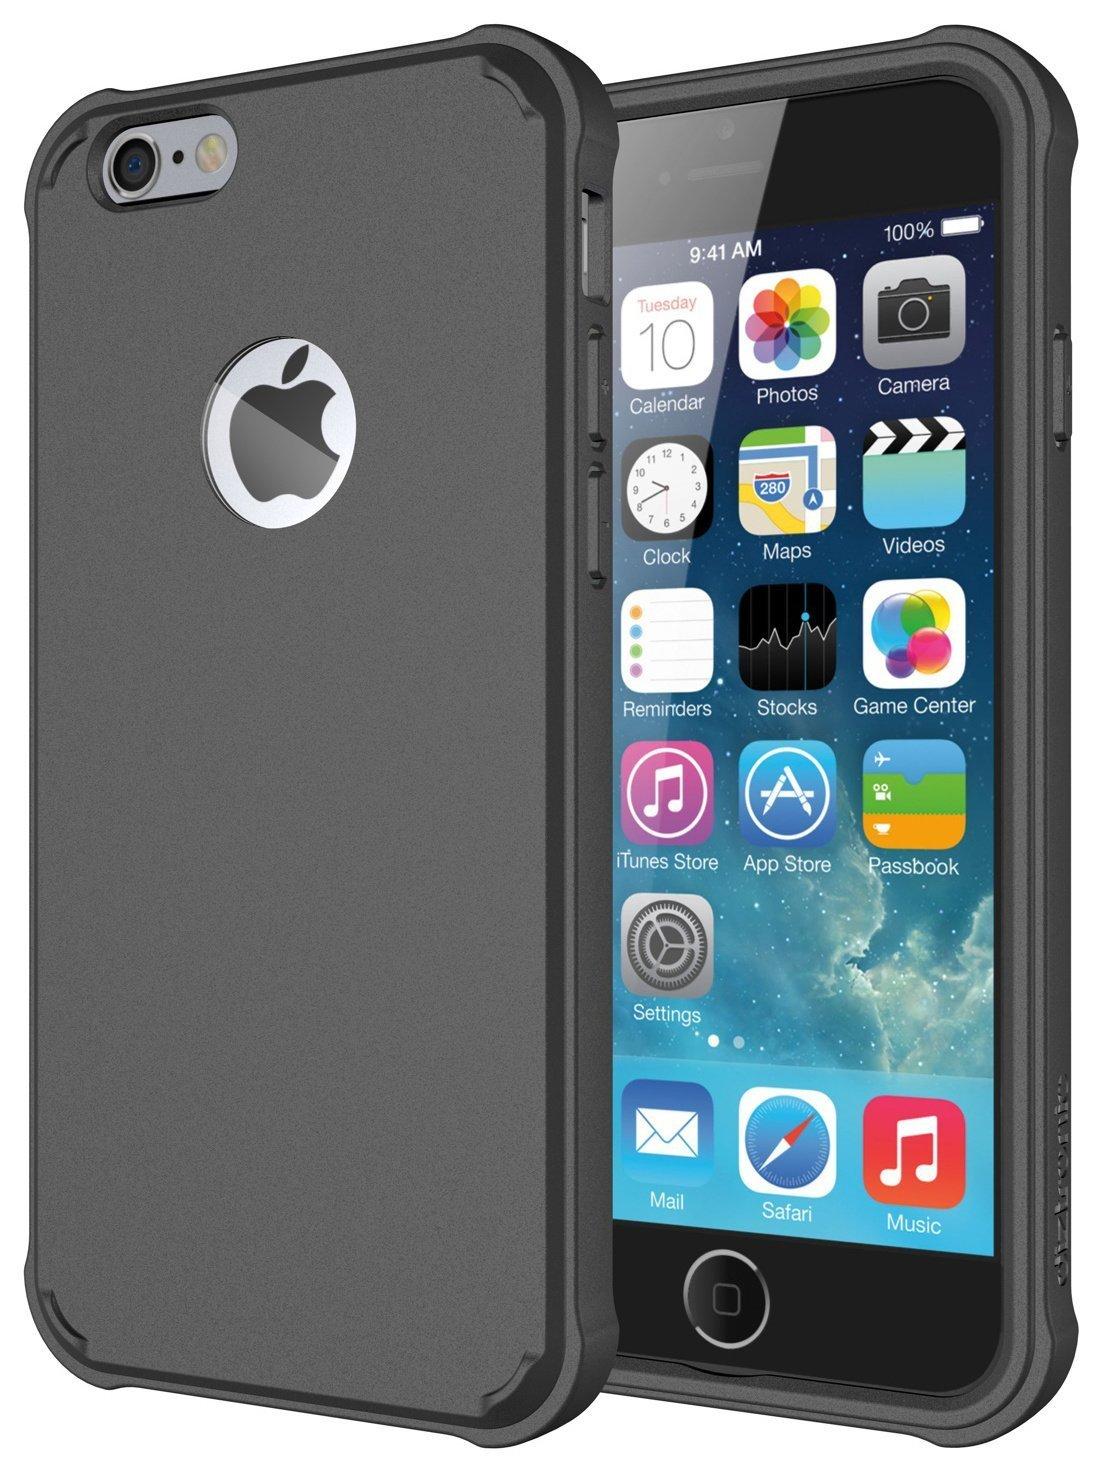 Diztronic Voyeur Case for Apple iPhone 6 (Full Matte Charcoal Gray)  Electrónica Más información y comentarios de clientes